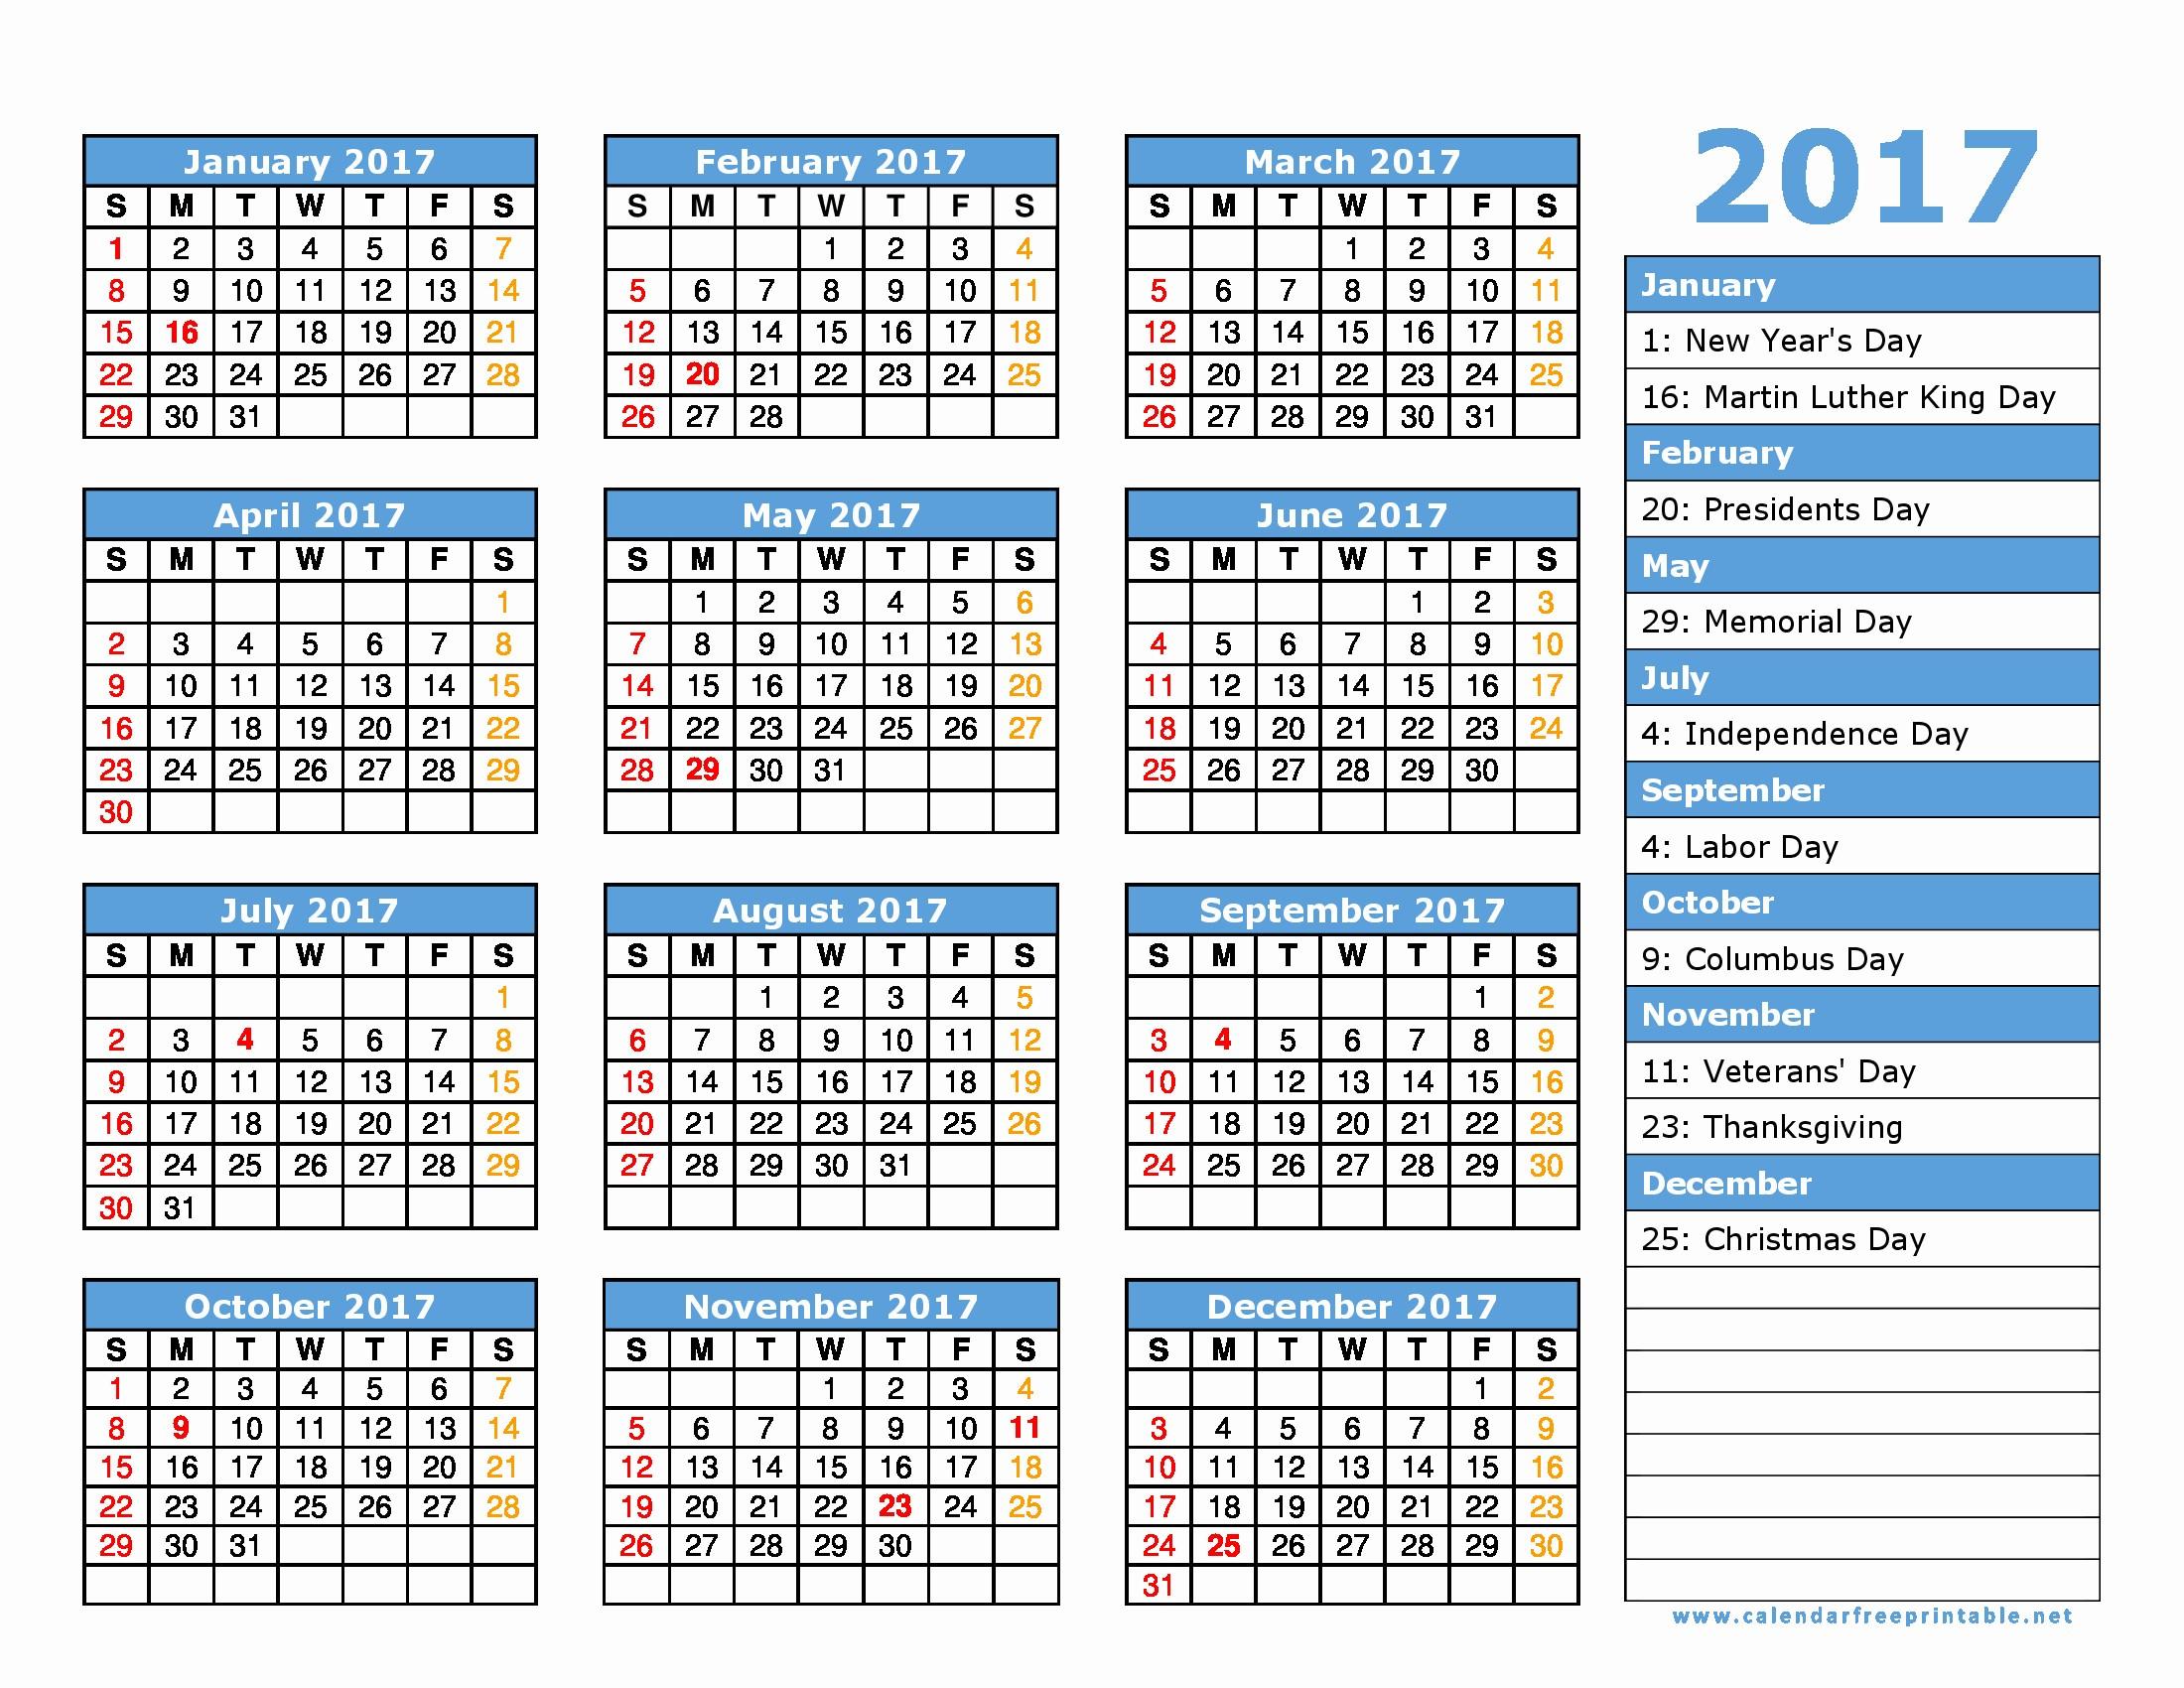 Calendar 2017 Template with Holidays New 2017 Calendar Printable with Holidays